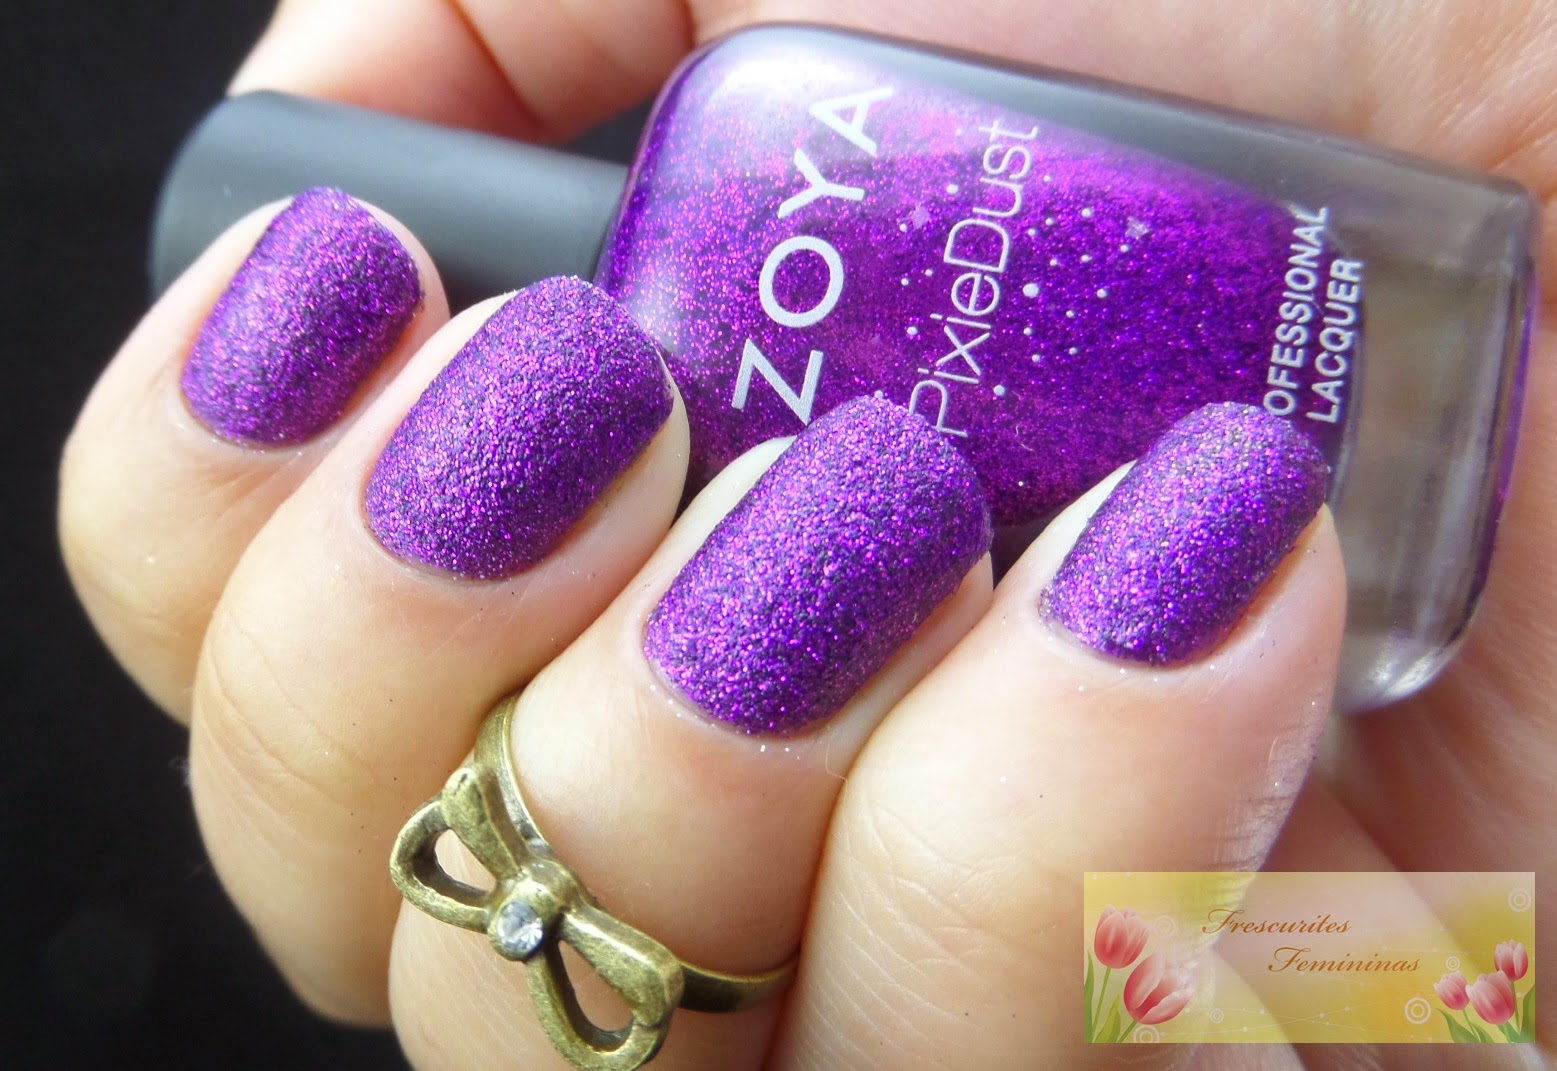 Violet Nails, Zoya Carter, Frescurites Femininas, Zoya